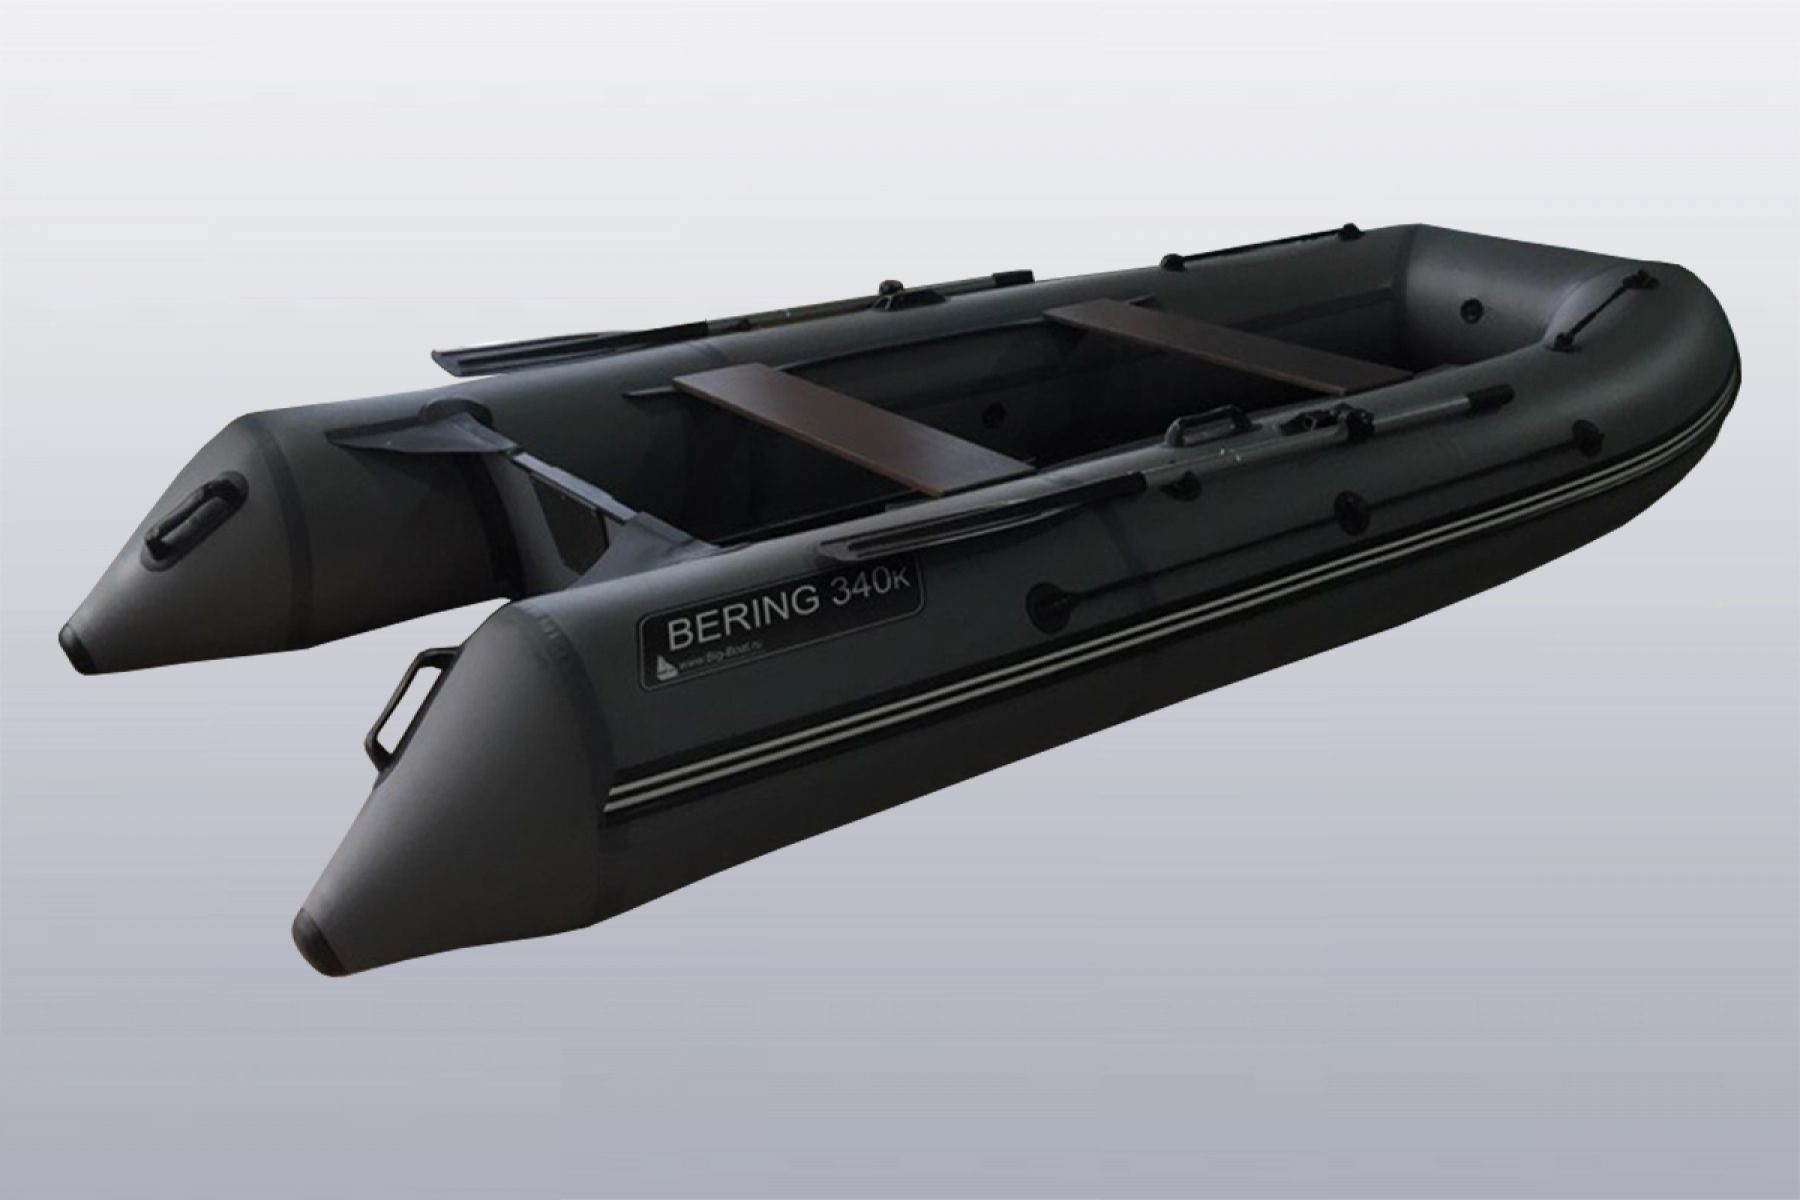 Лодка ПВХ Bering (Беринг) 340К